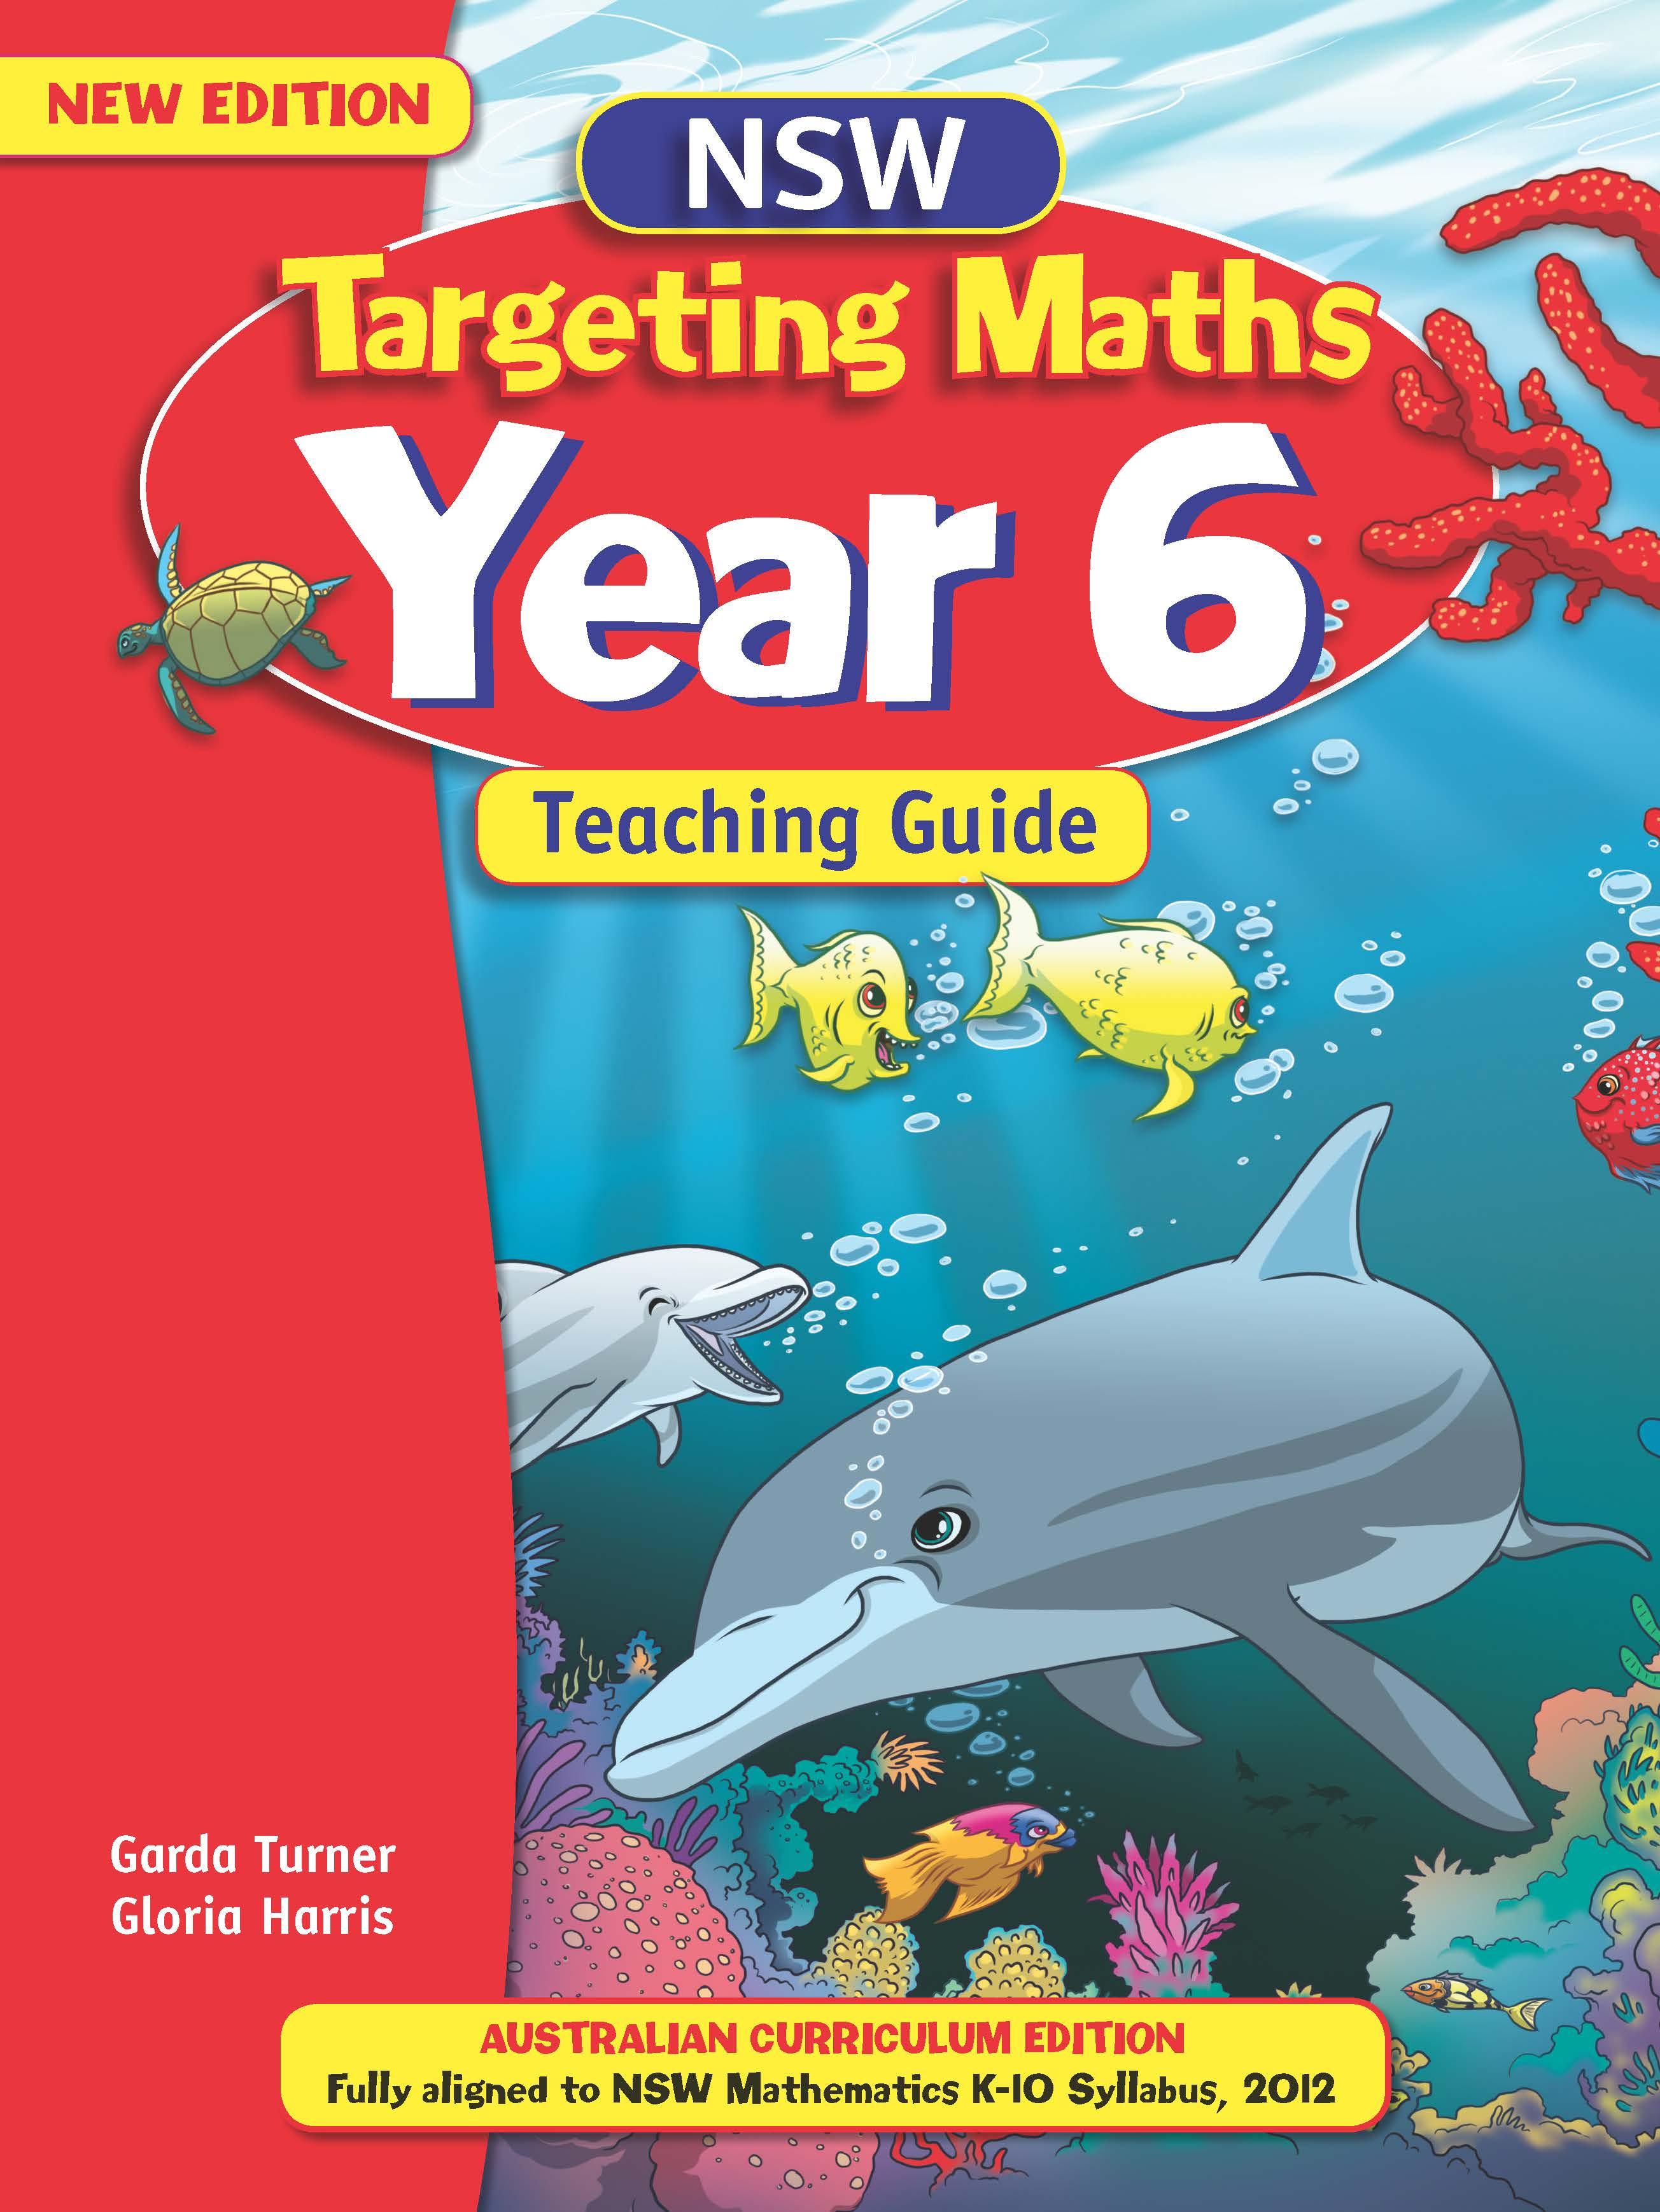 NSW Targeting Maths Australian Curriculum Teaching Guide Year 6